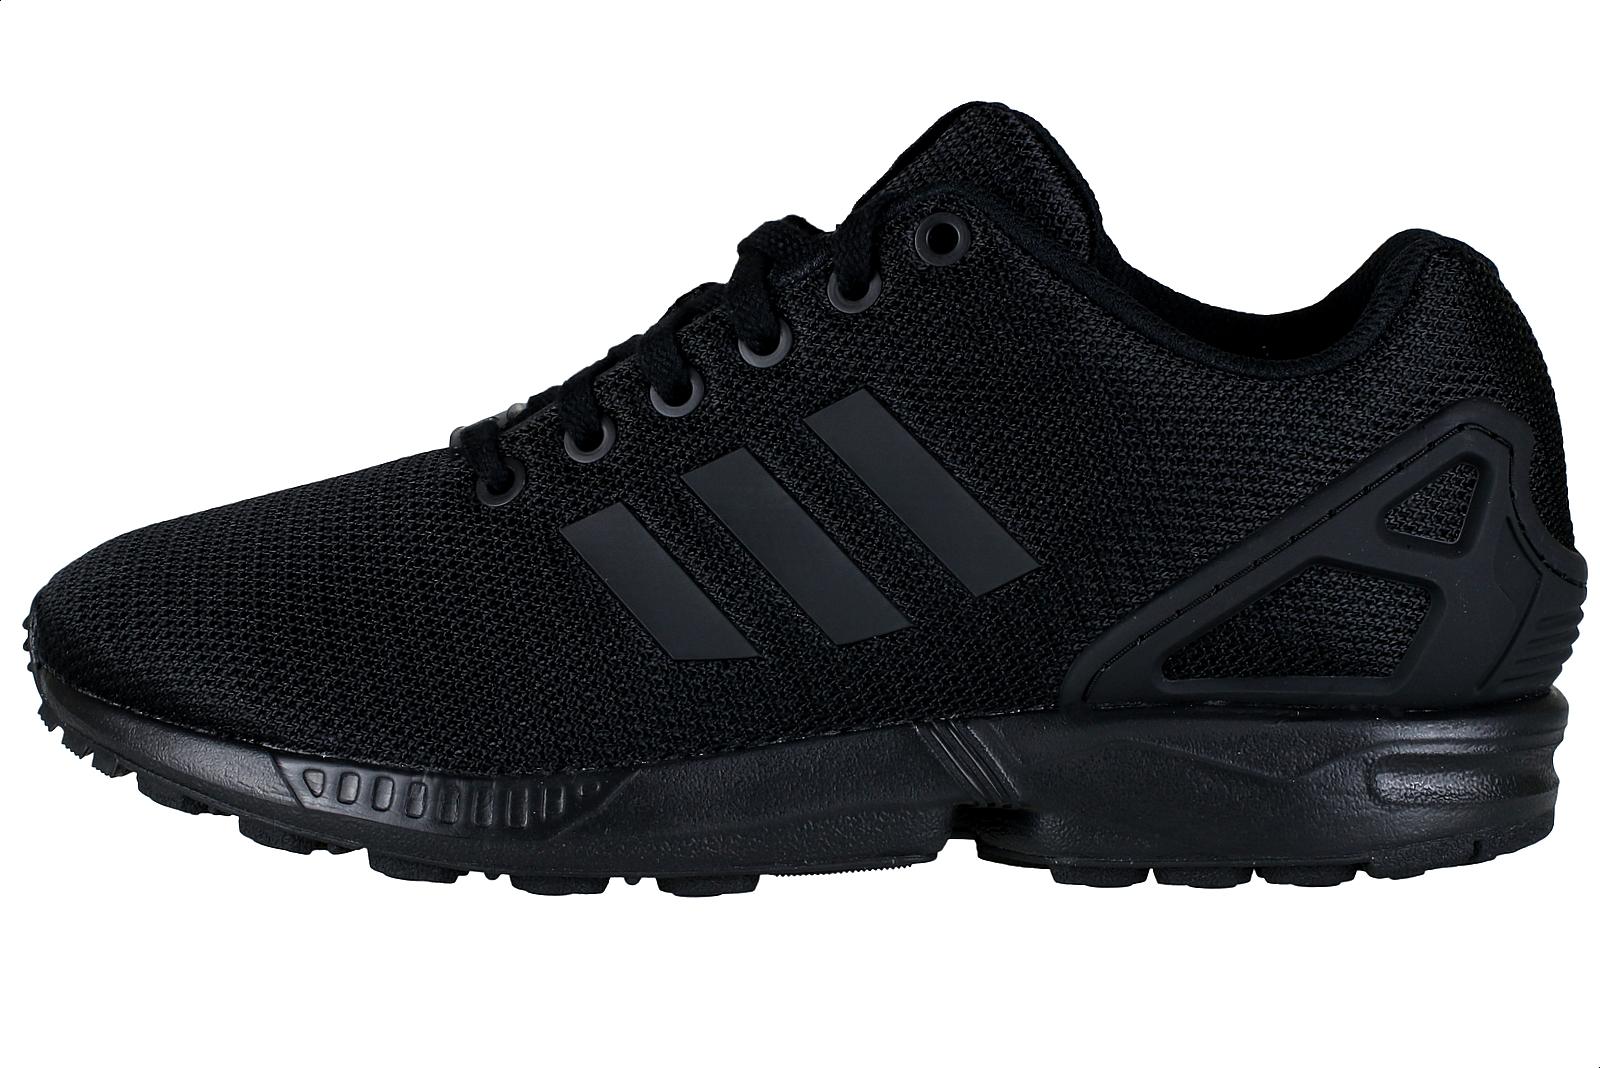 934c2f900 ... promo code for buty adidas zx flux s32279 r.41 1 3 1a58c 41d3e